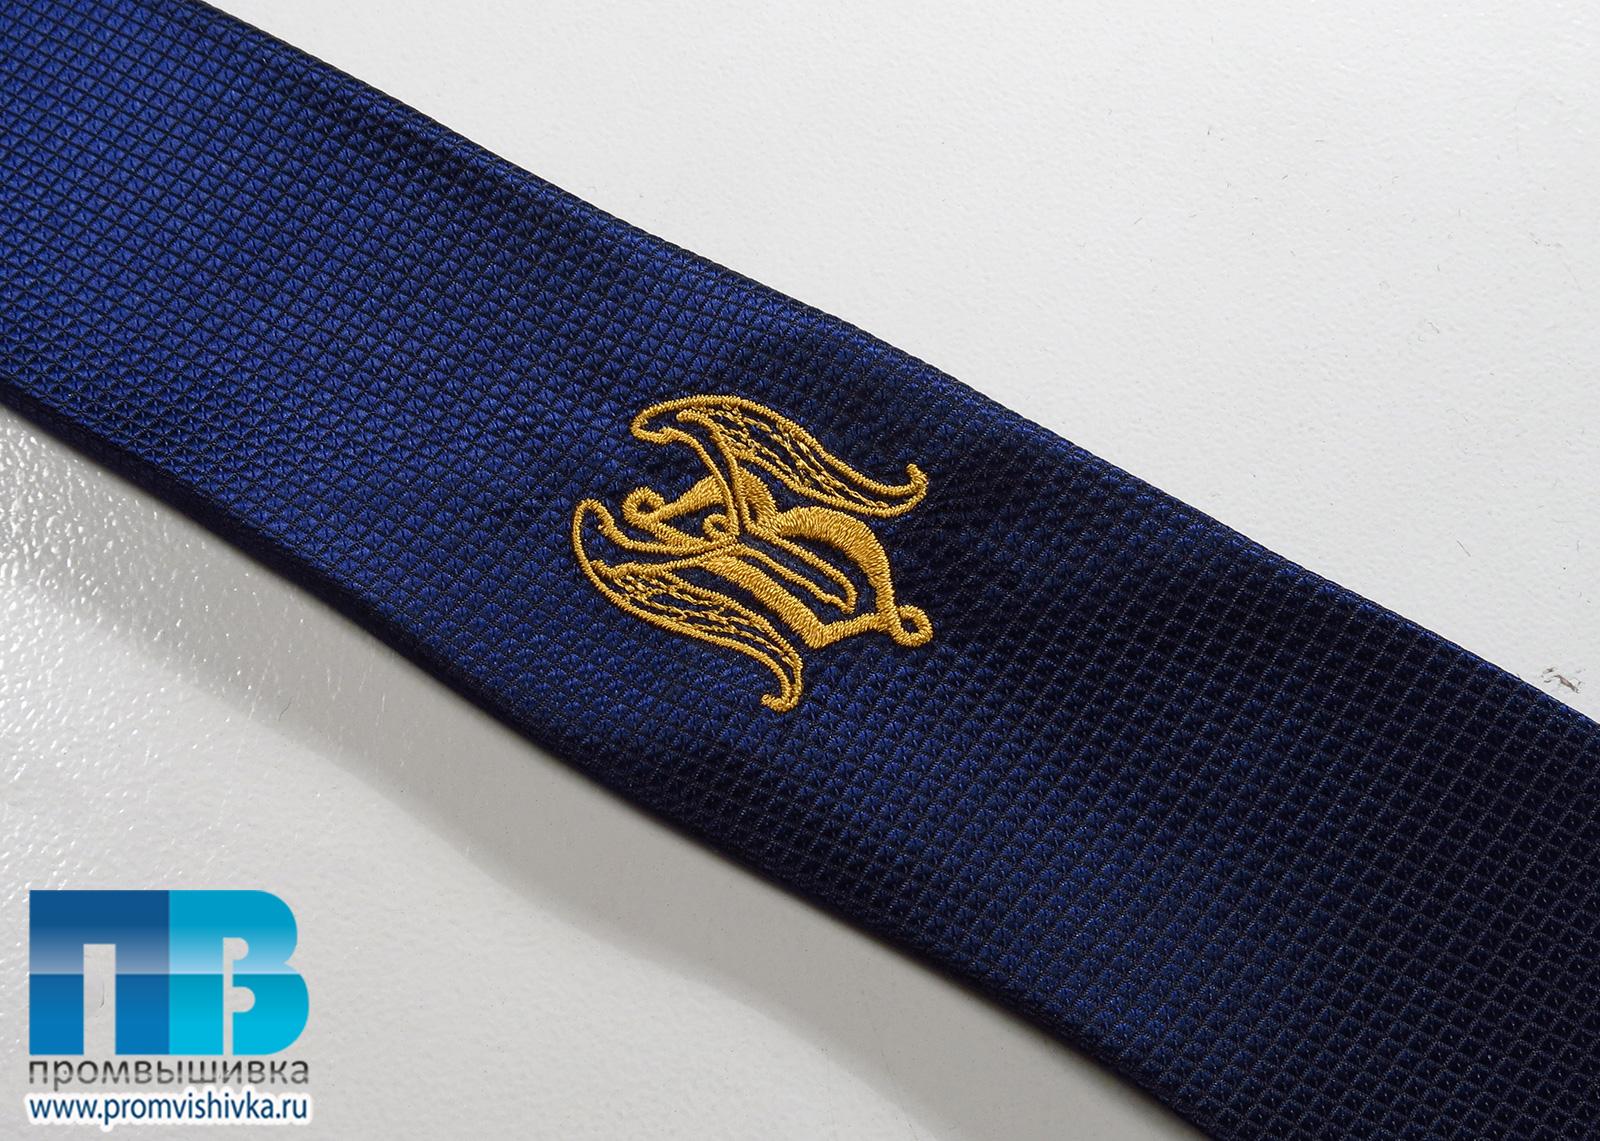 Вышивка логотипа на ленте